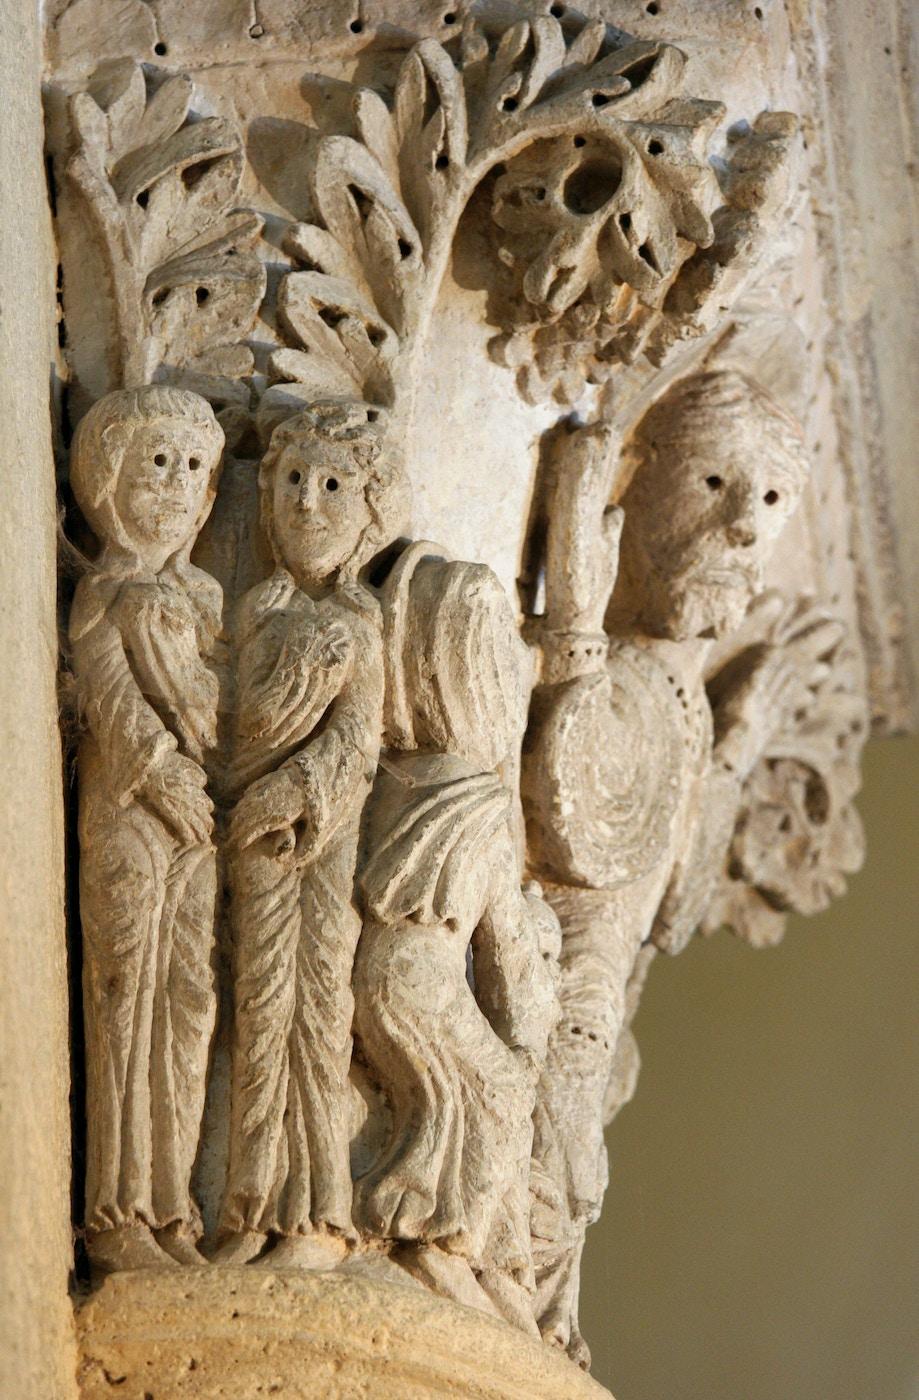 Capital: Three Women Meet the Risen Christ